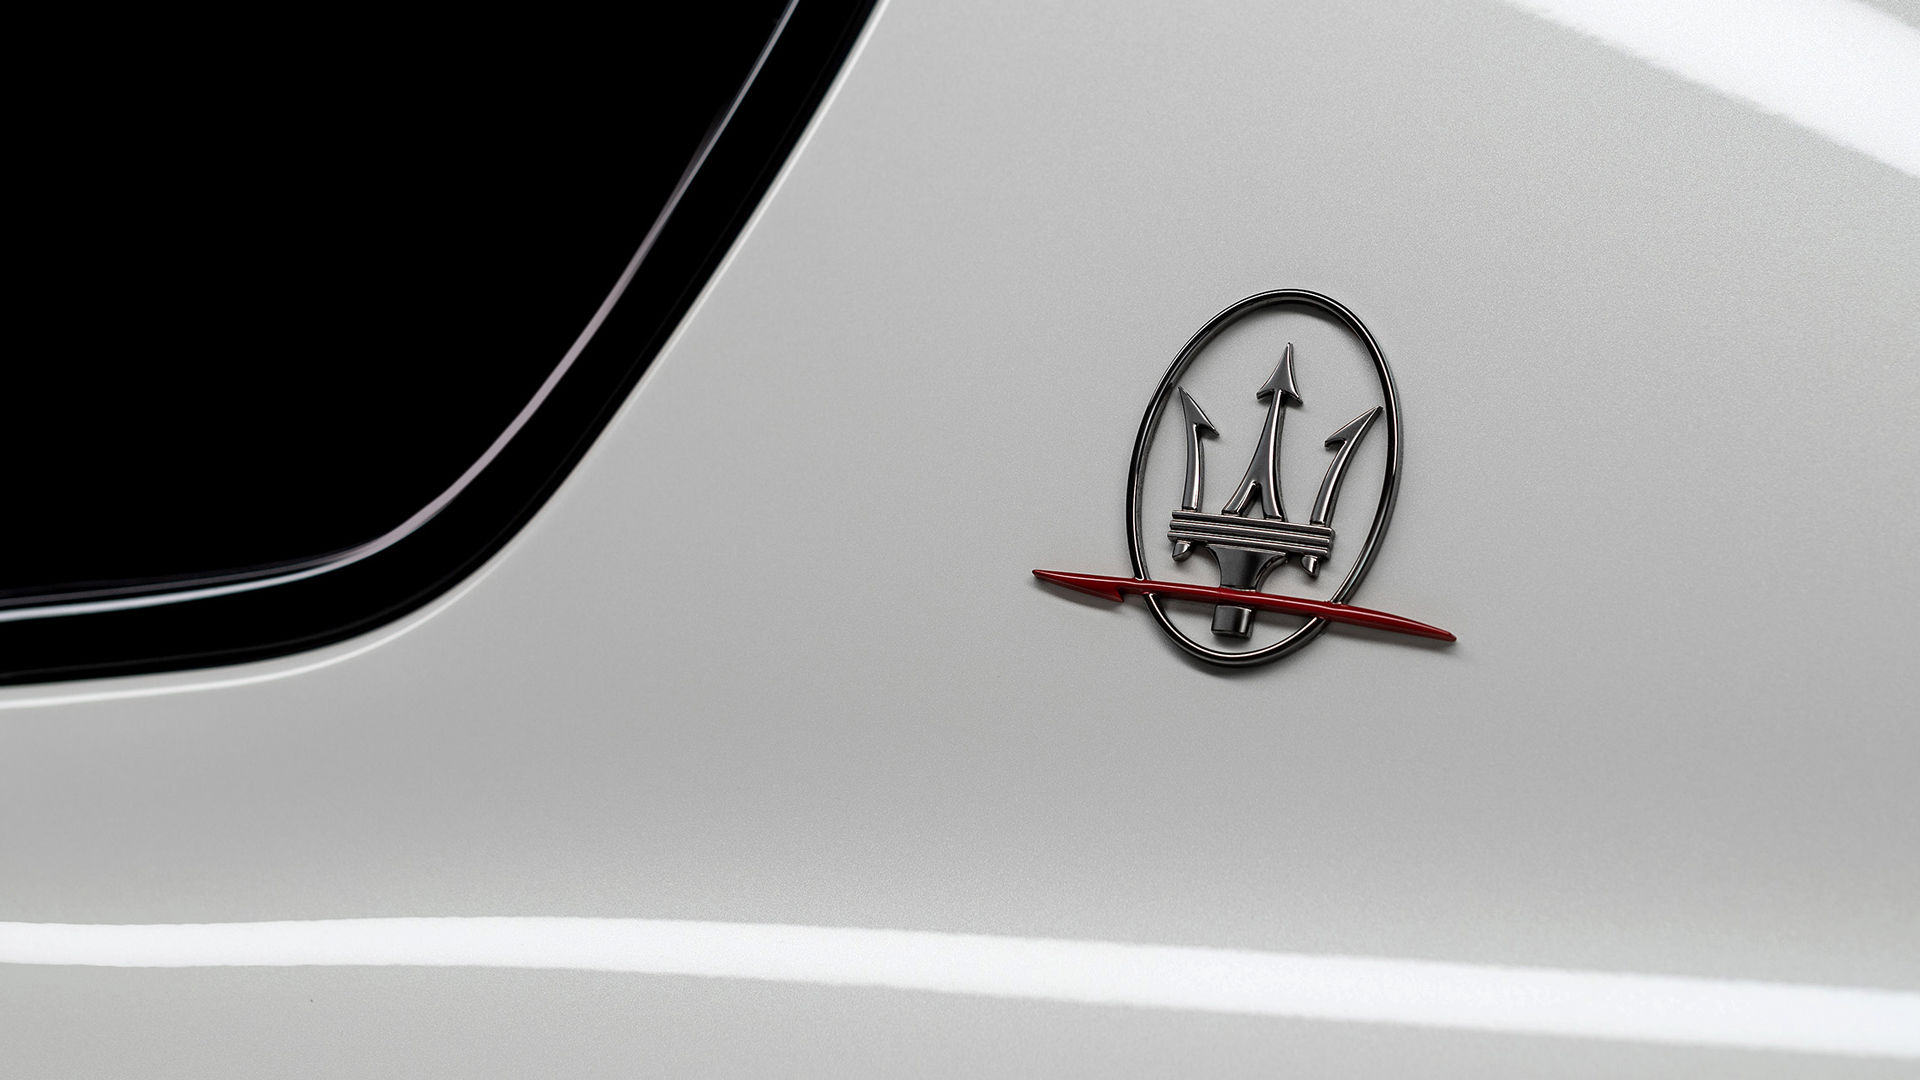 Maserati Levante Trofeo - Weiß - Dreizack Logo